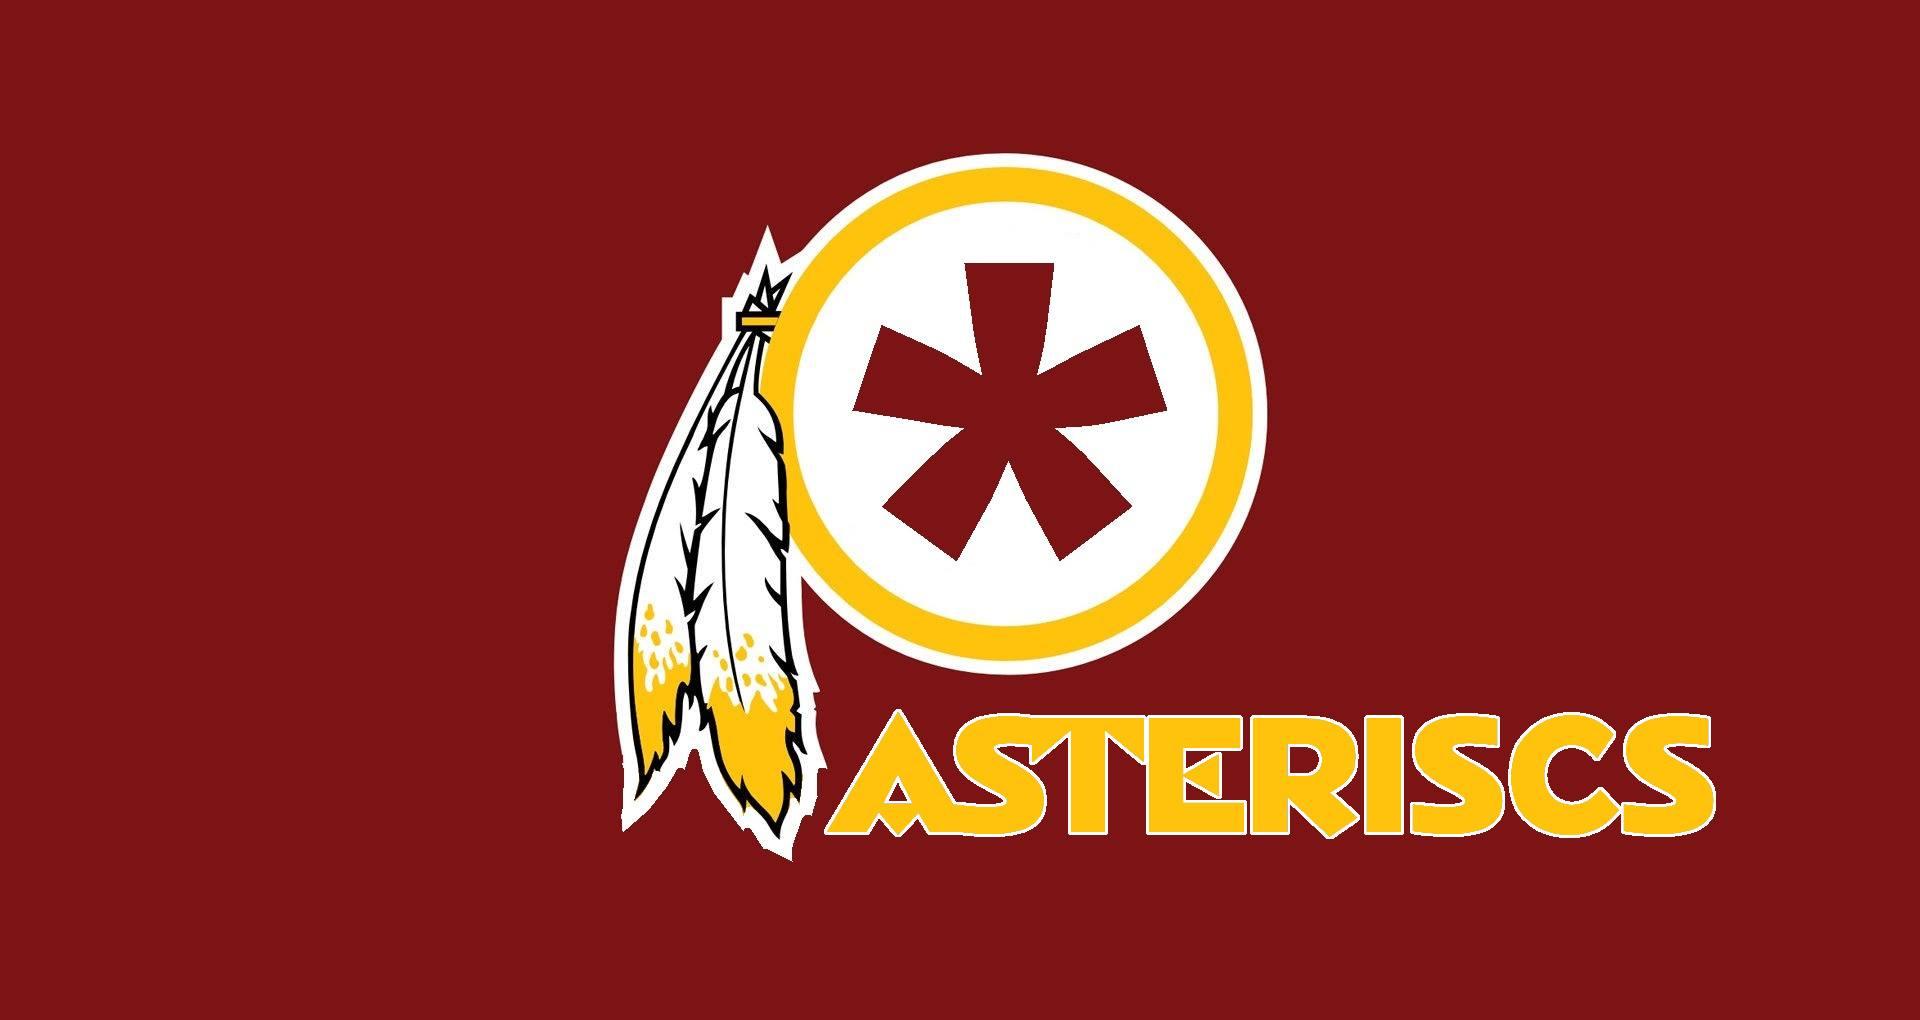 Washington Asteriscs